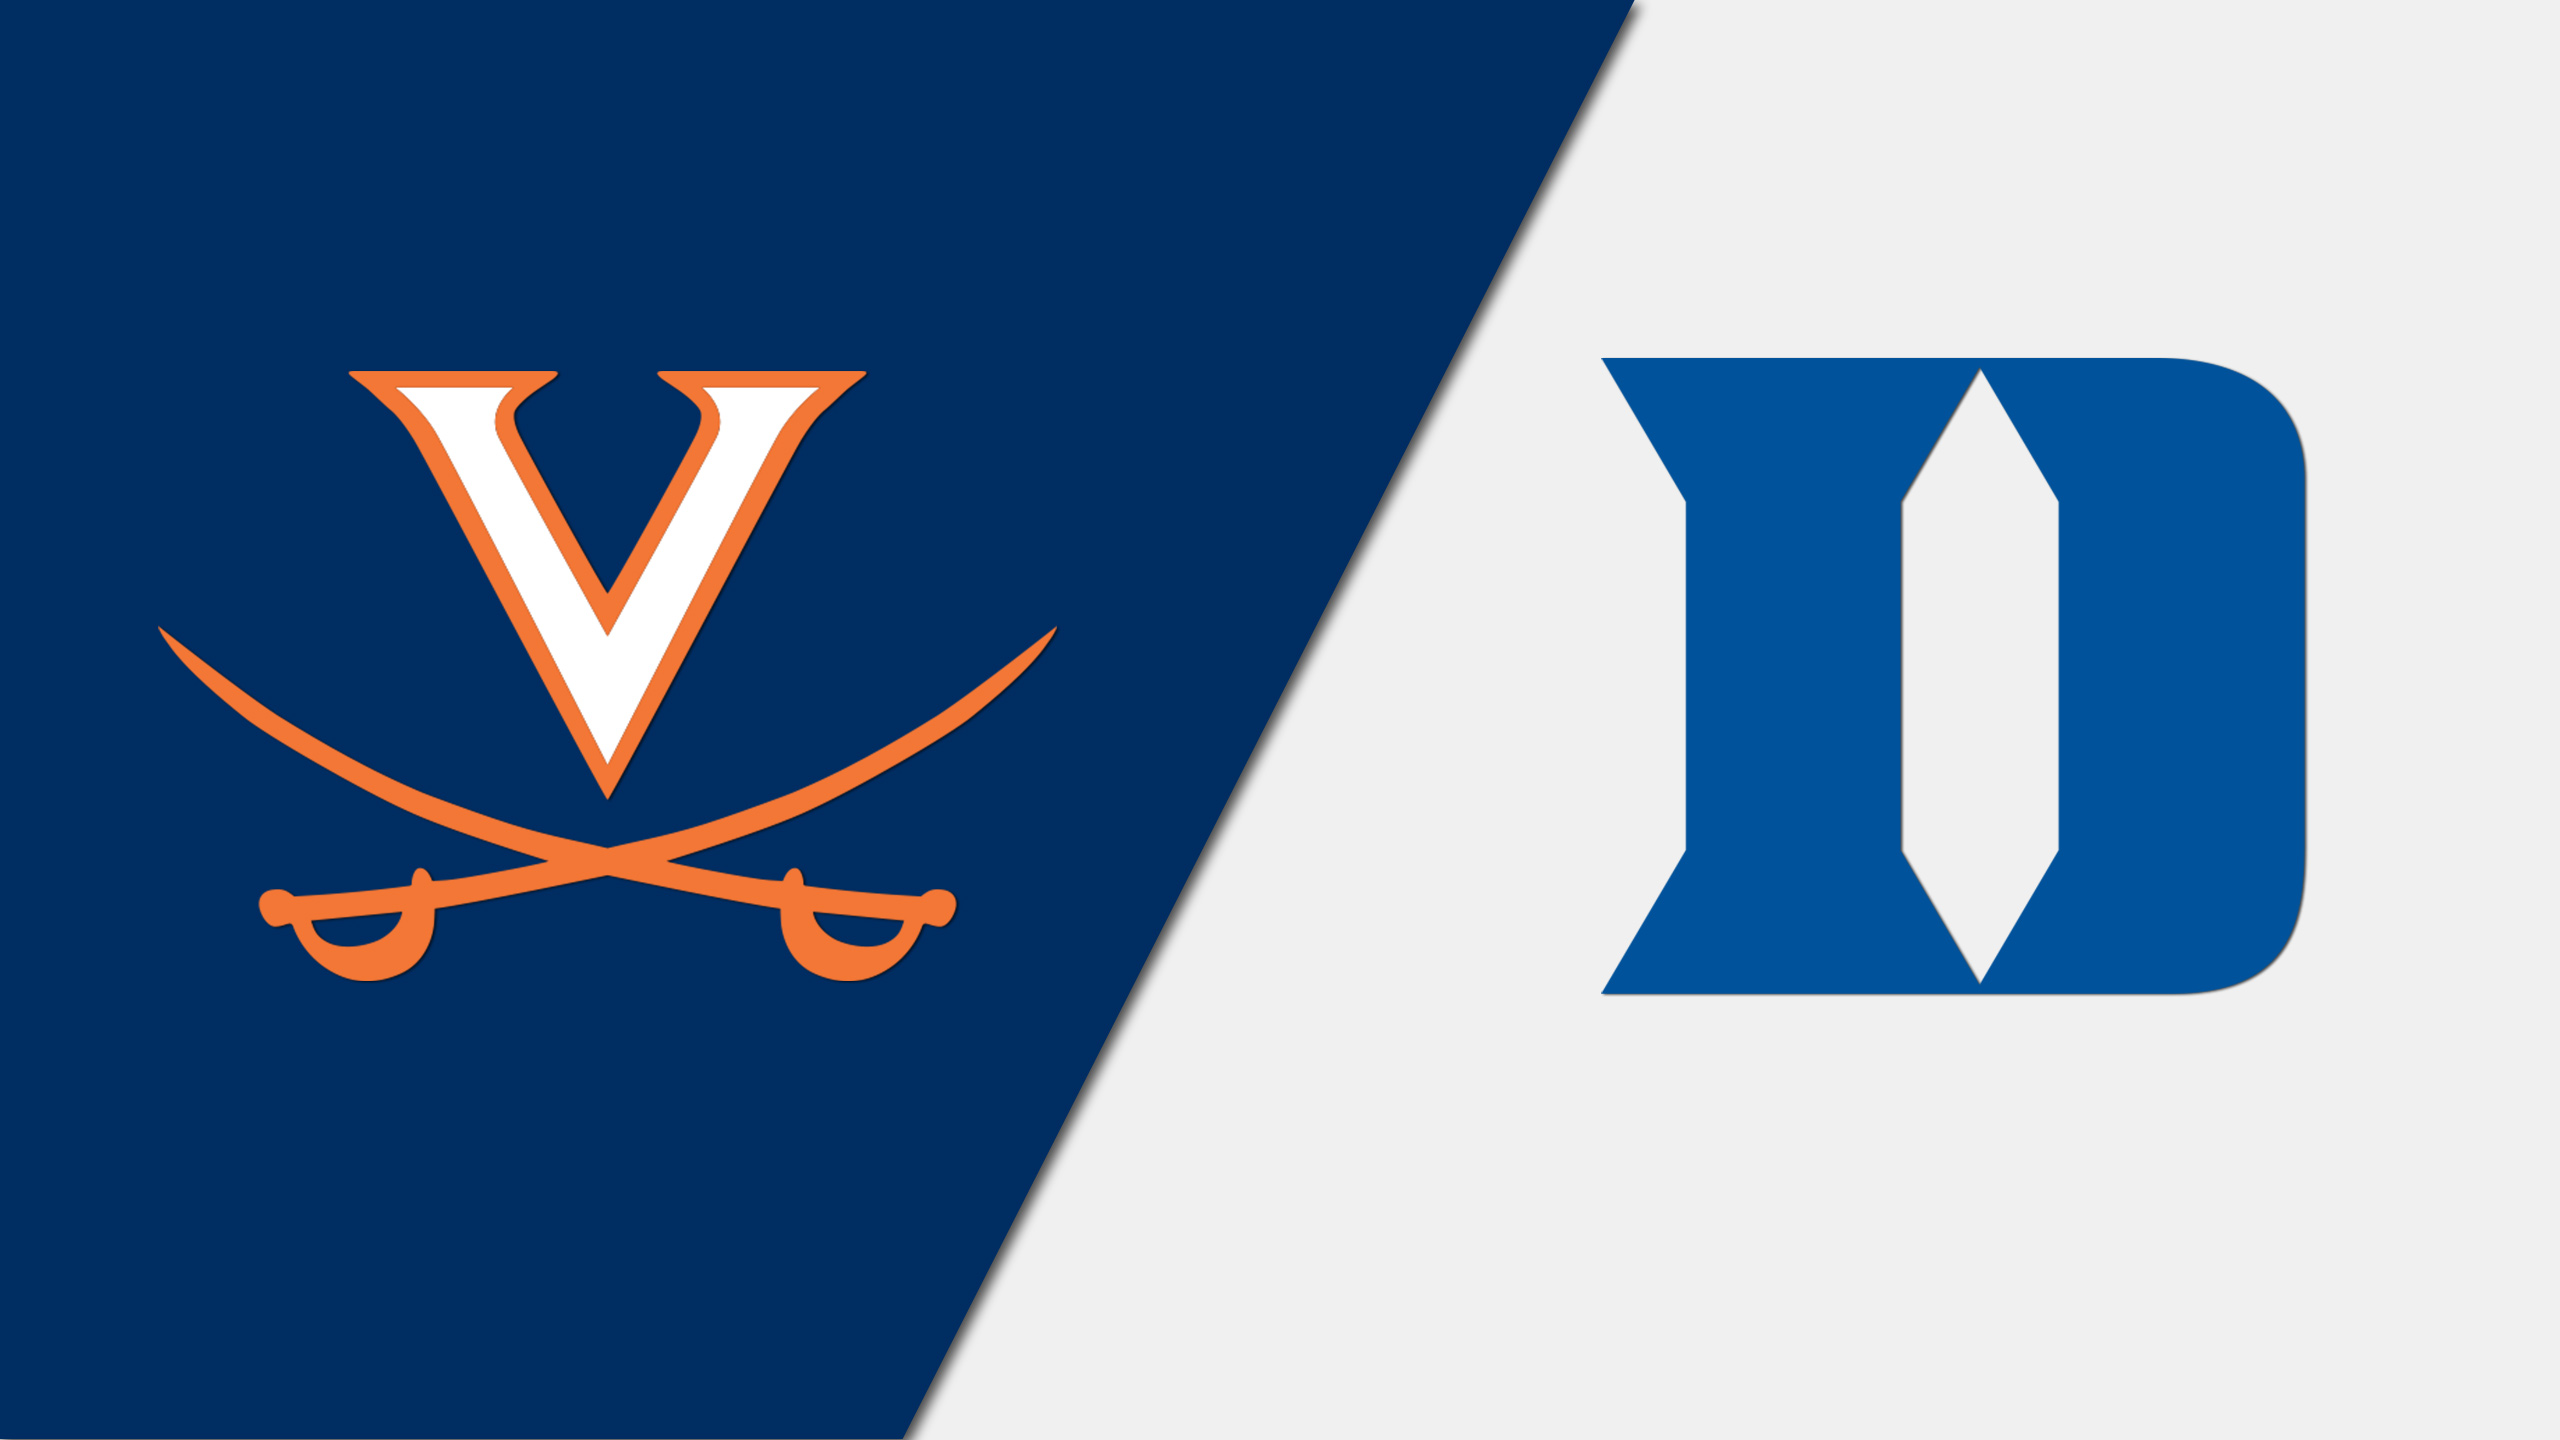 #3 Virginia vs. #2 Duke (Semifinal #1)